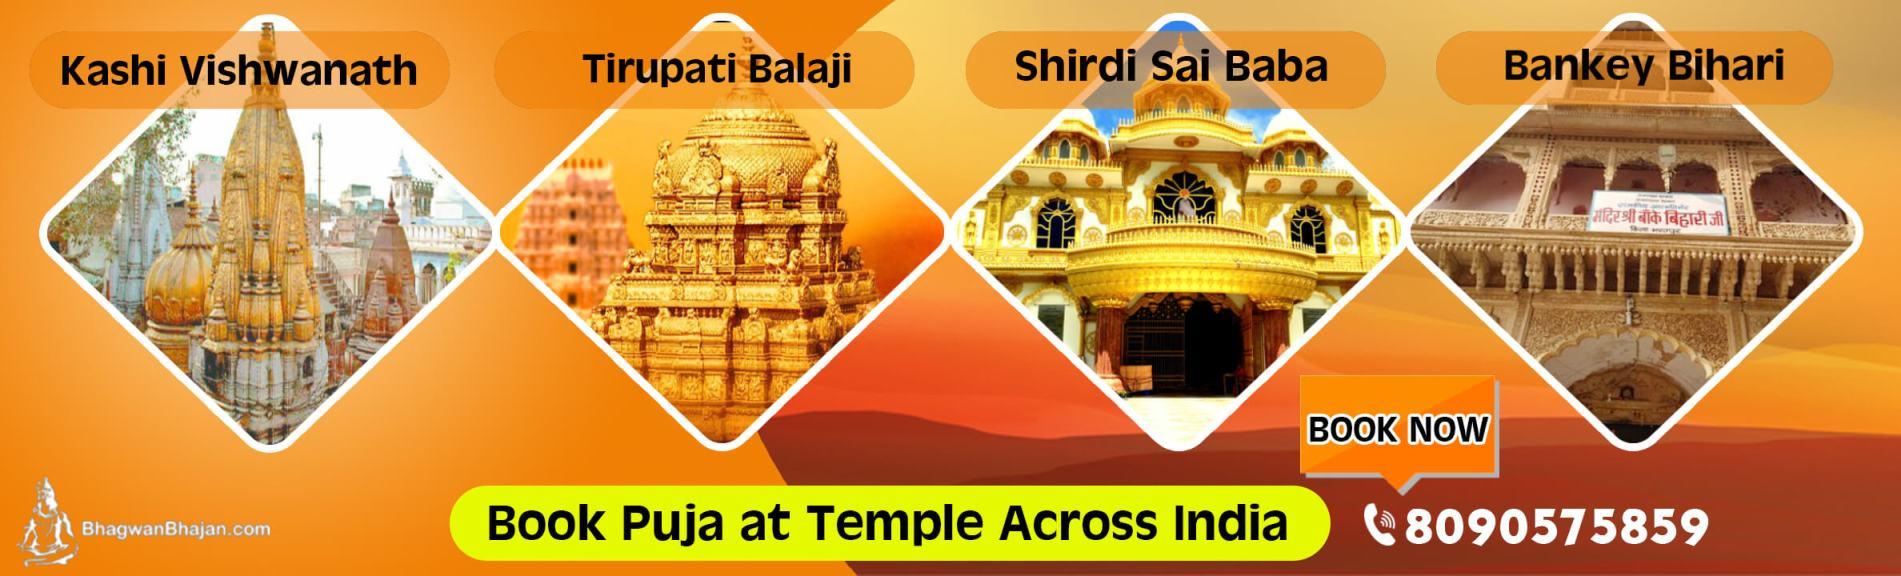 Book Puja Temple Across India Online on bhagwanbhajan